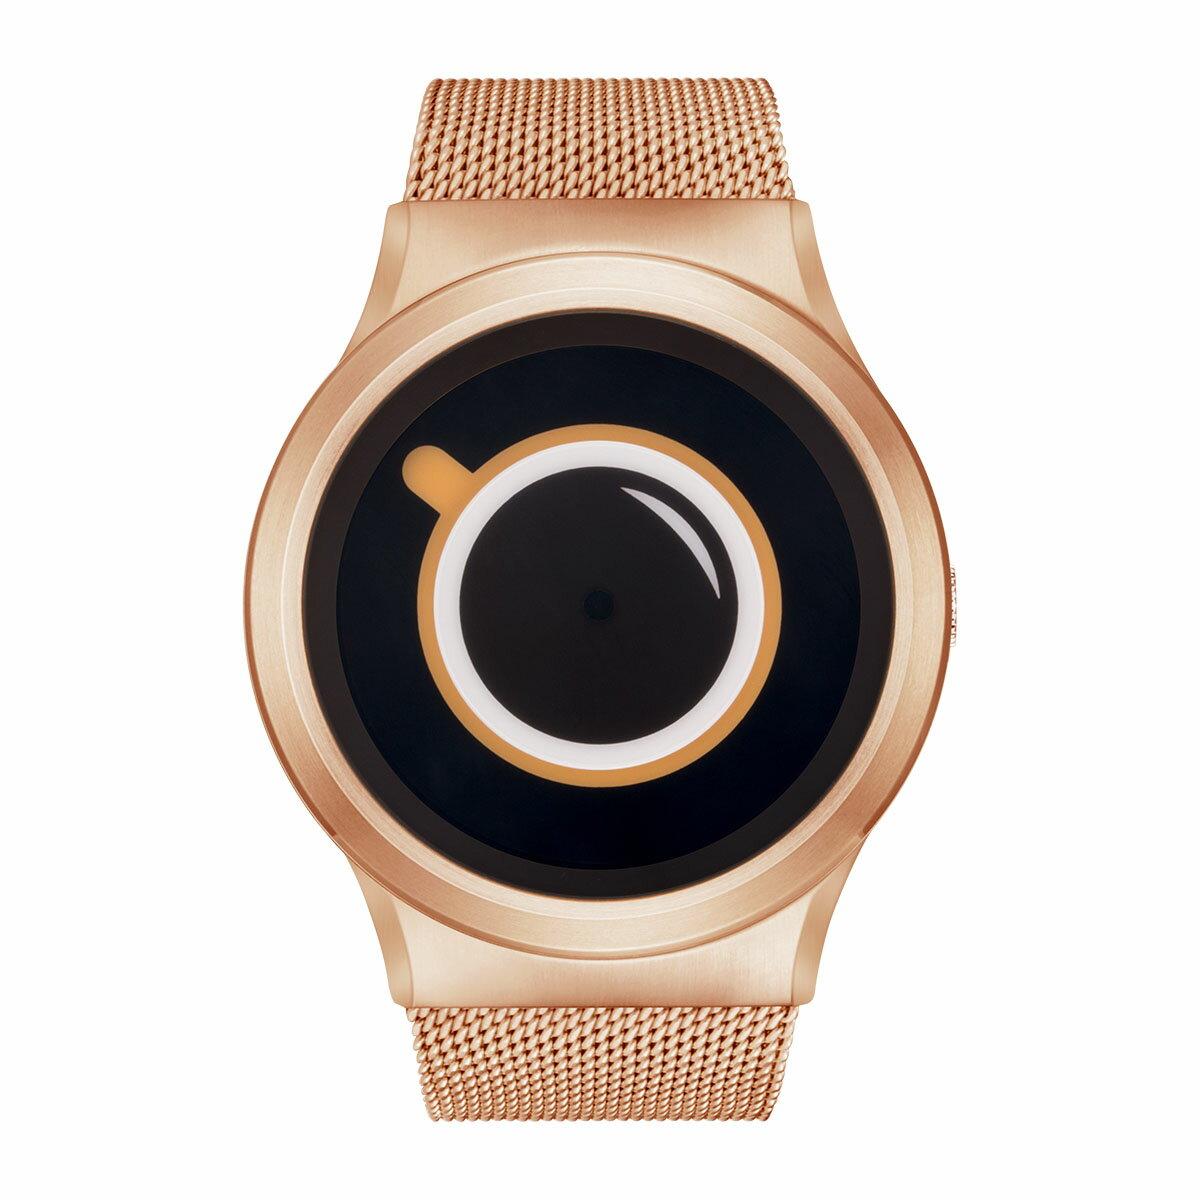 ZEROO COFFEE TIME ゼロ 電池式クォーツ 腕時計 [W03009B05SM05] ベージュ デザインウォッチ ペア用 メンズ レディース ユニセックス おしゃれ時計 デザイナーズ